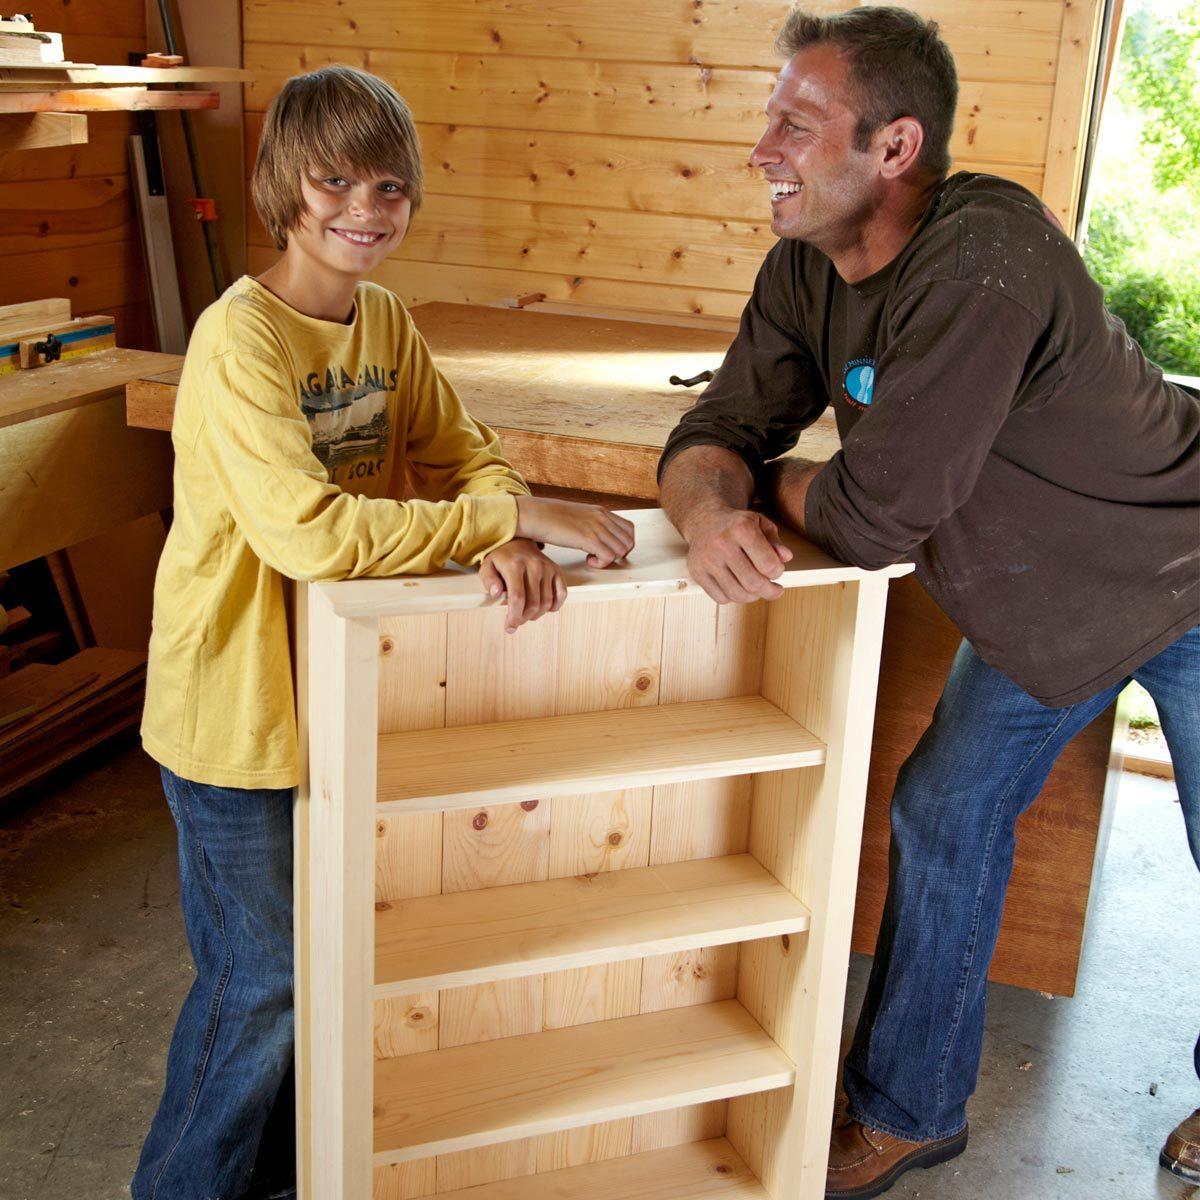 Simple Diy Bookshelf Plans The Family Handyman